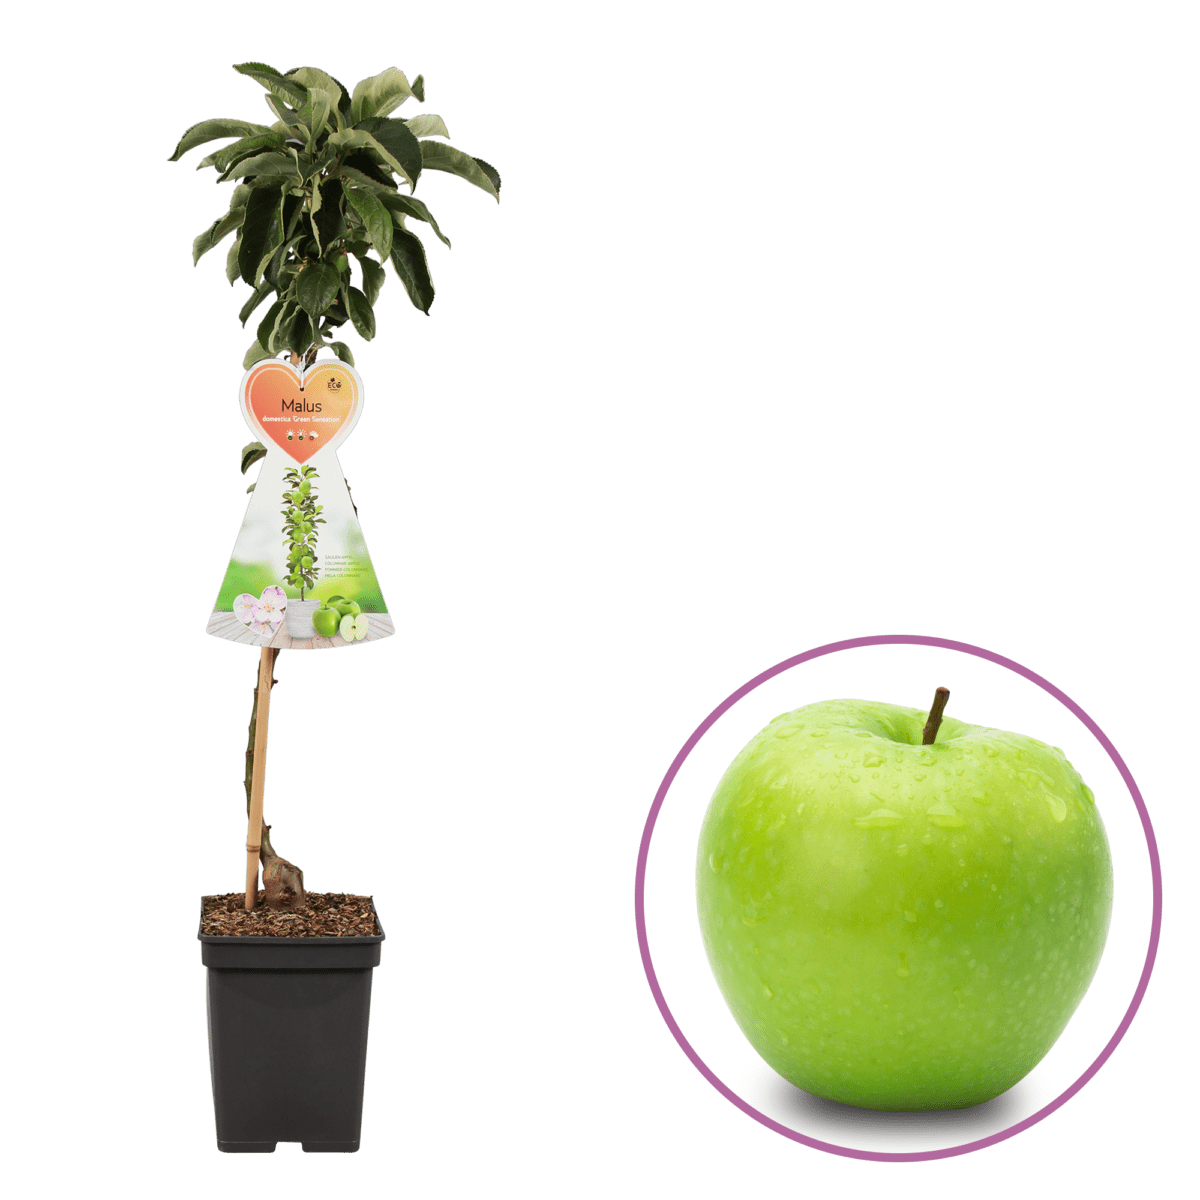 boskoopsefruitbomen | appelboom met losse appel